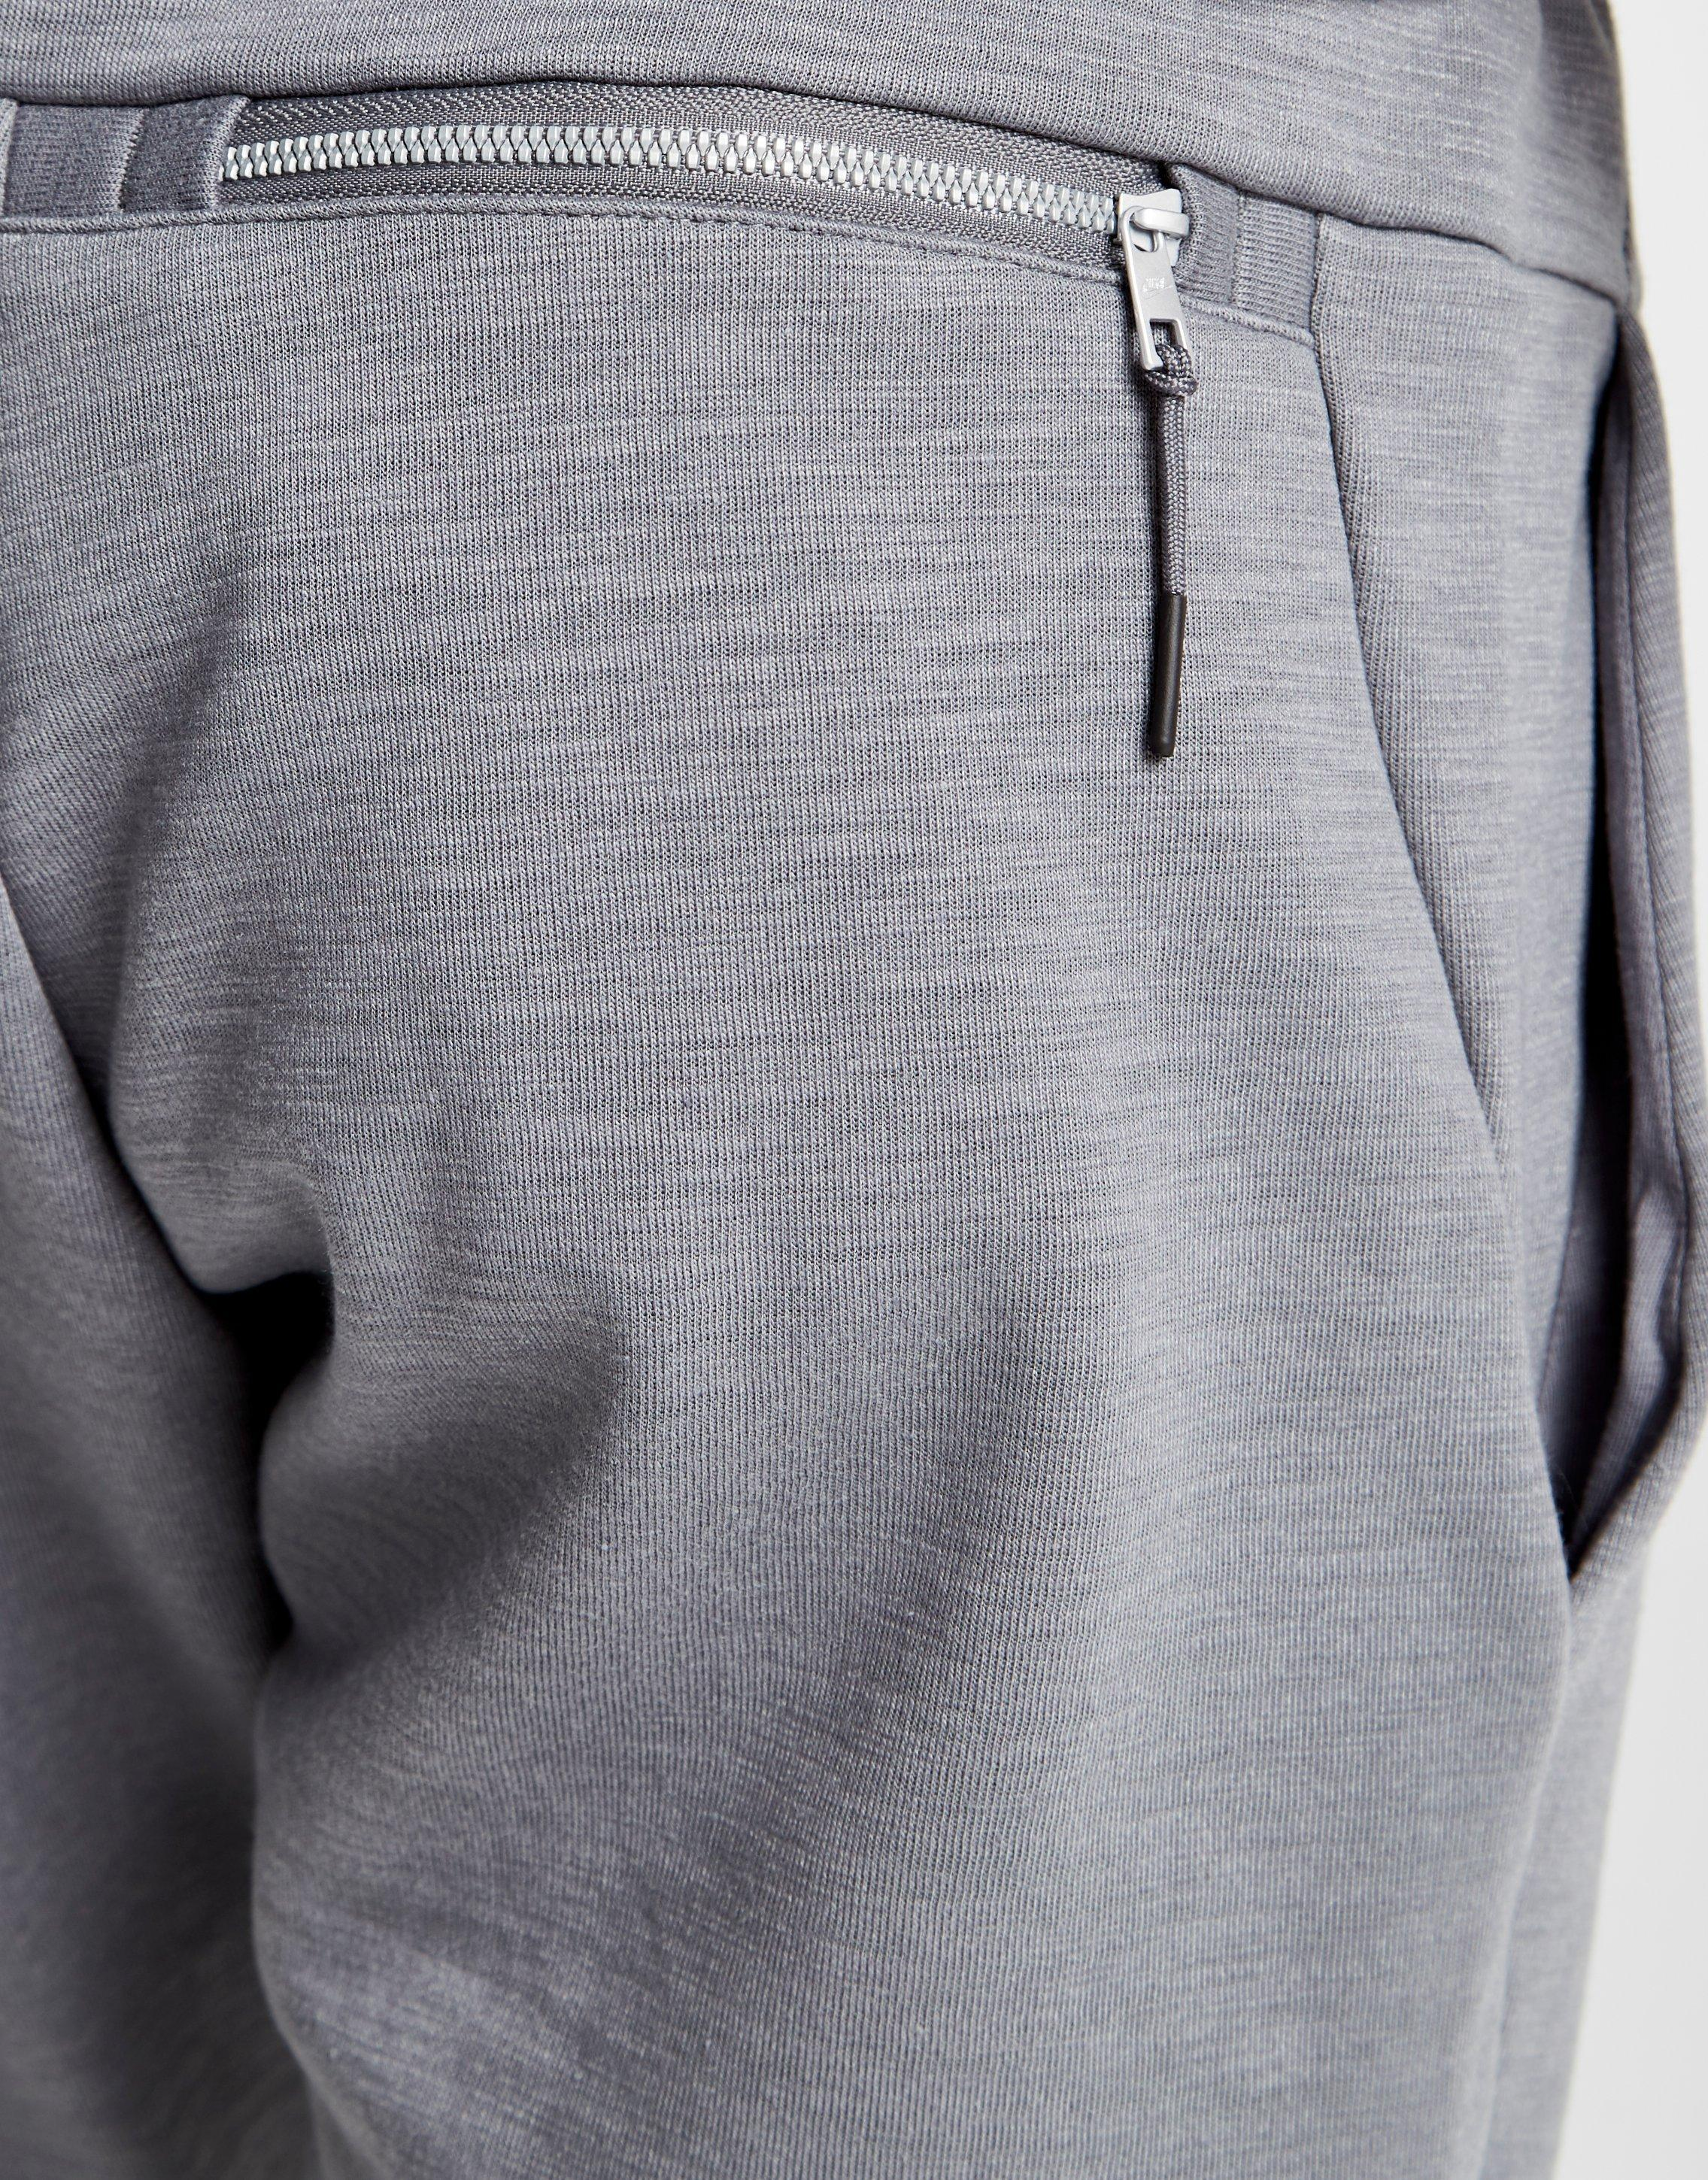 4bce95a49bab Nike Optic Fleece Pants in Gray for Men - Lyst